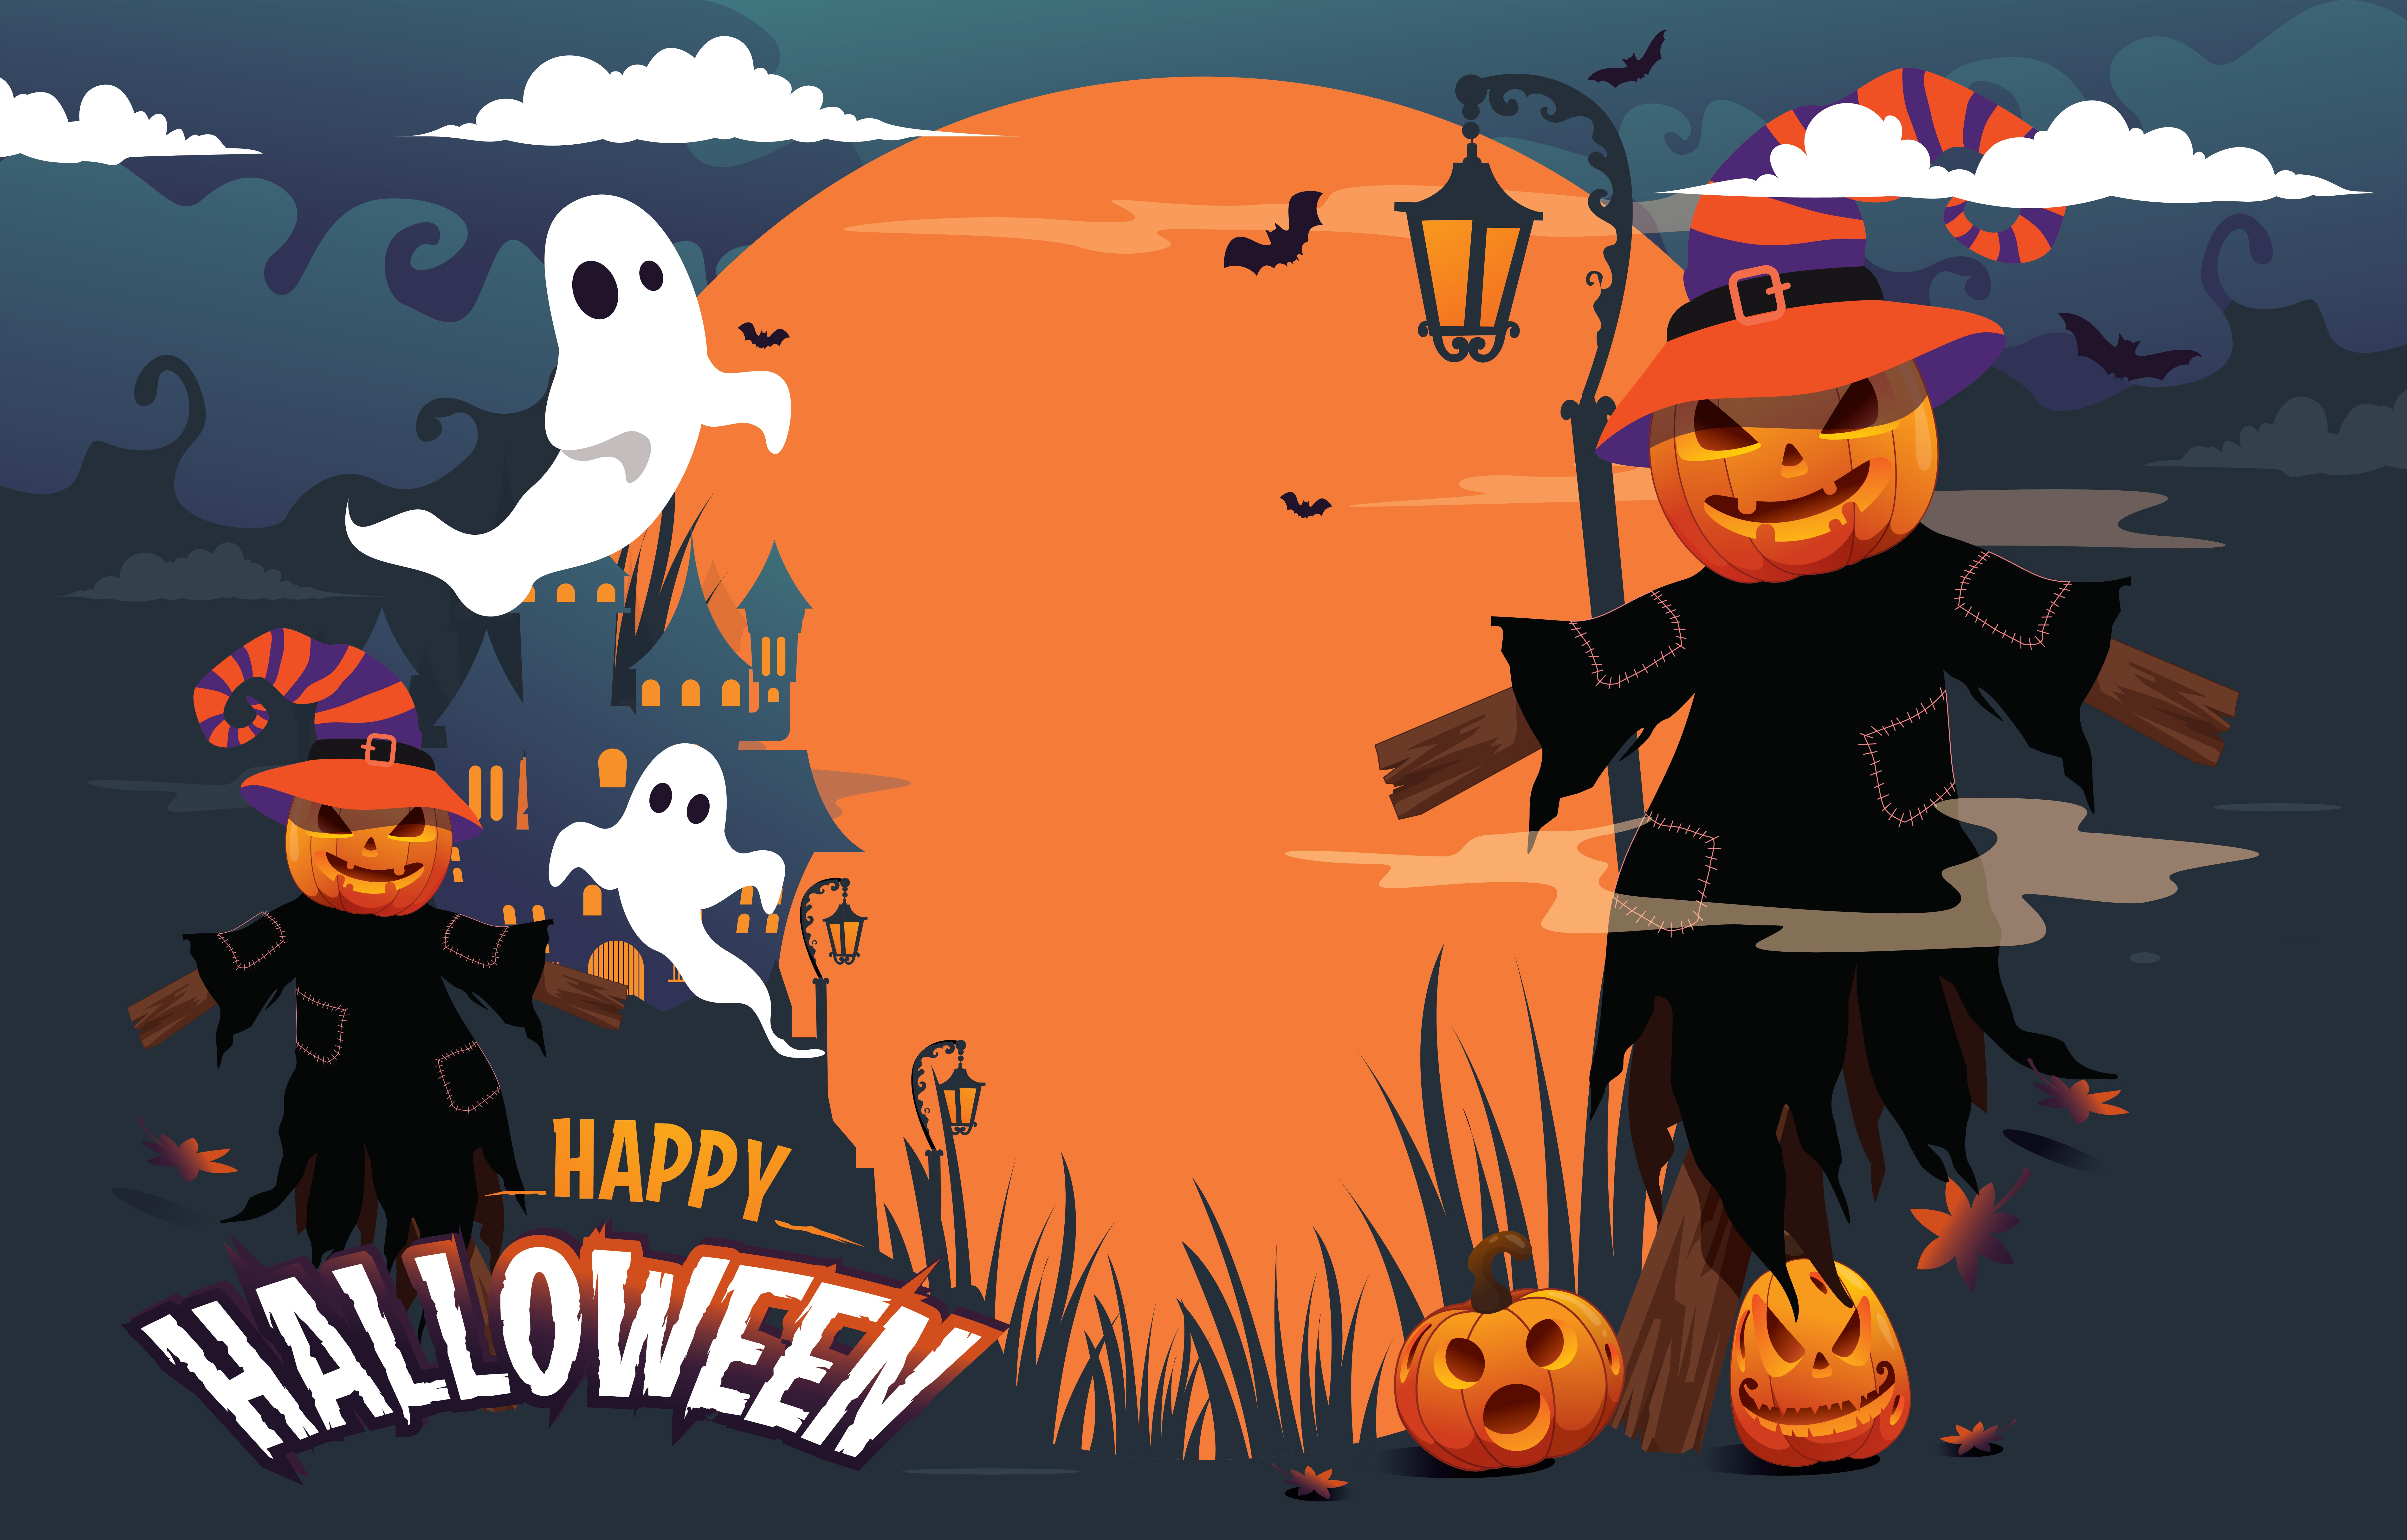 Creepy Jack O Lantern Background Download Free Vectors Clipart Graphics Vector Art